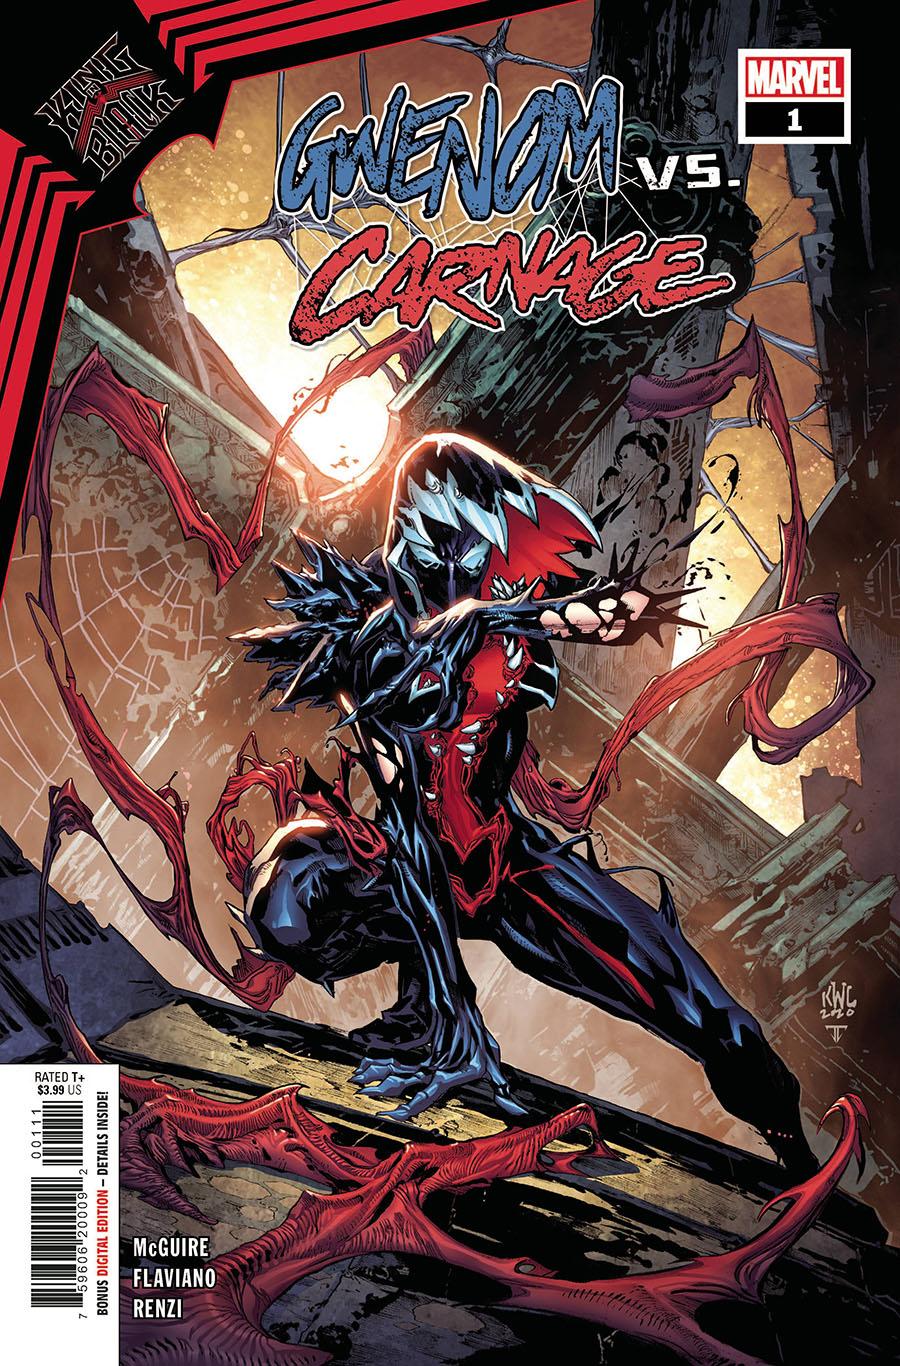 King In Black Gwenom vs Carnage #1 Cover A Regular Ken Lashley Cover